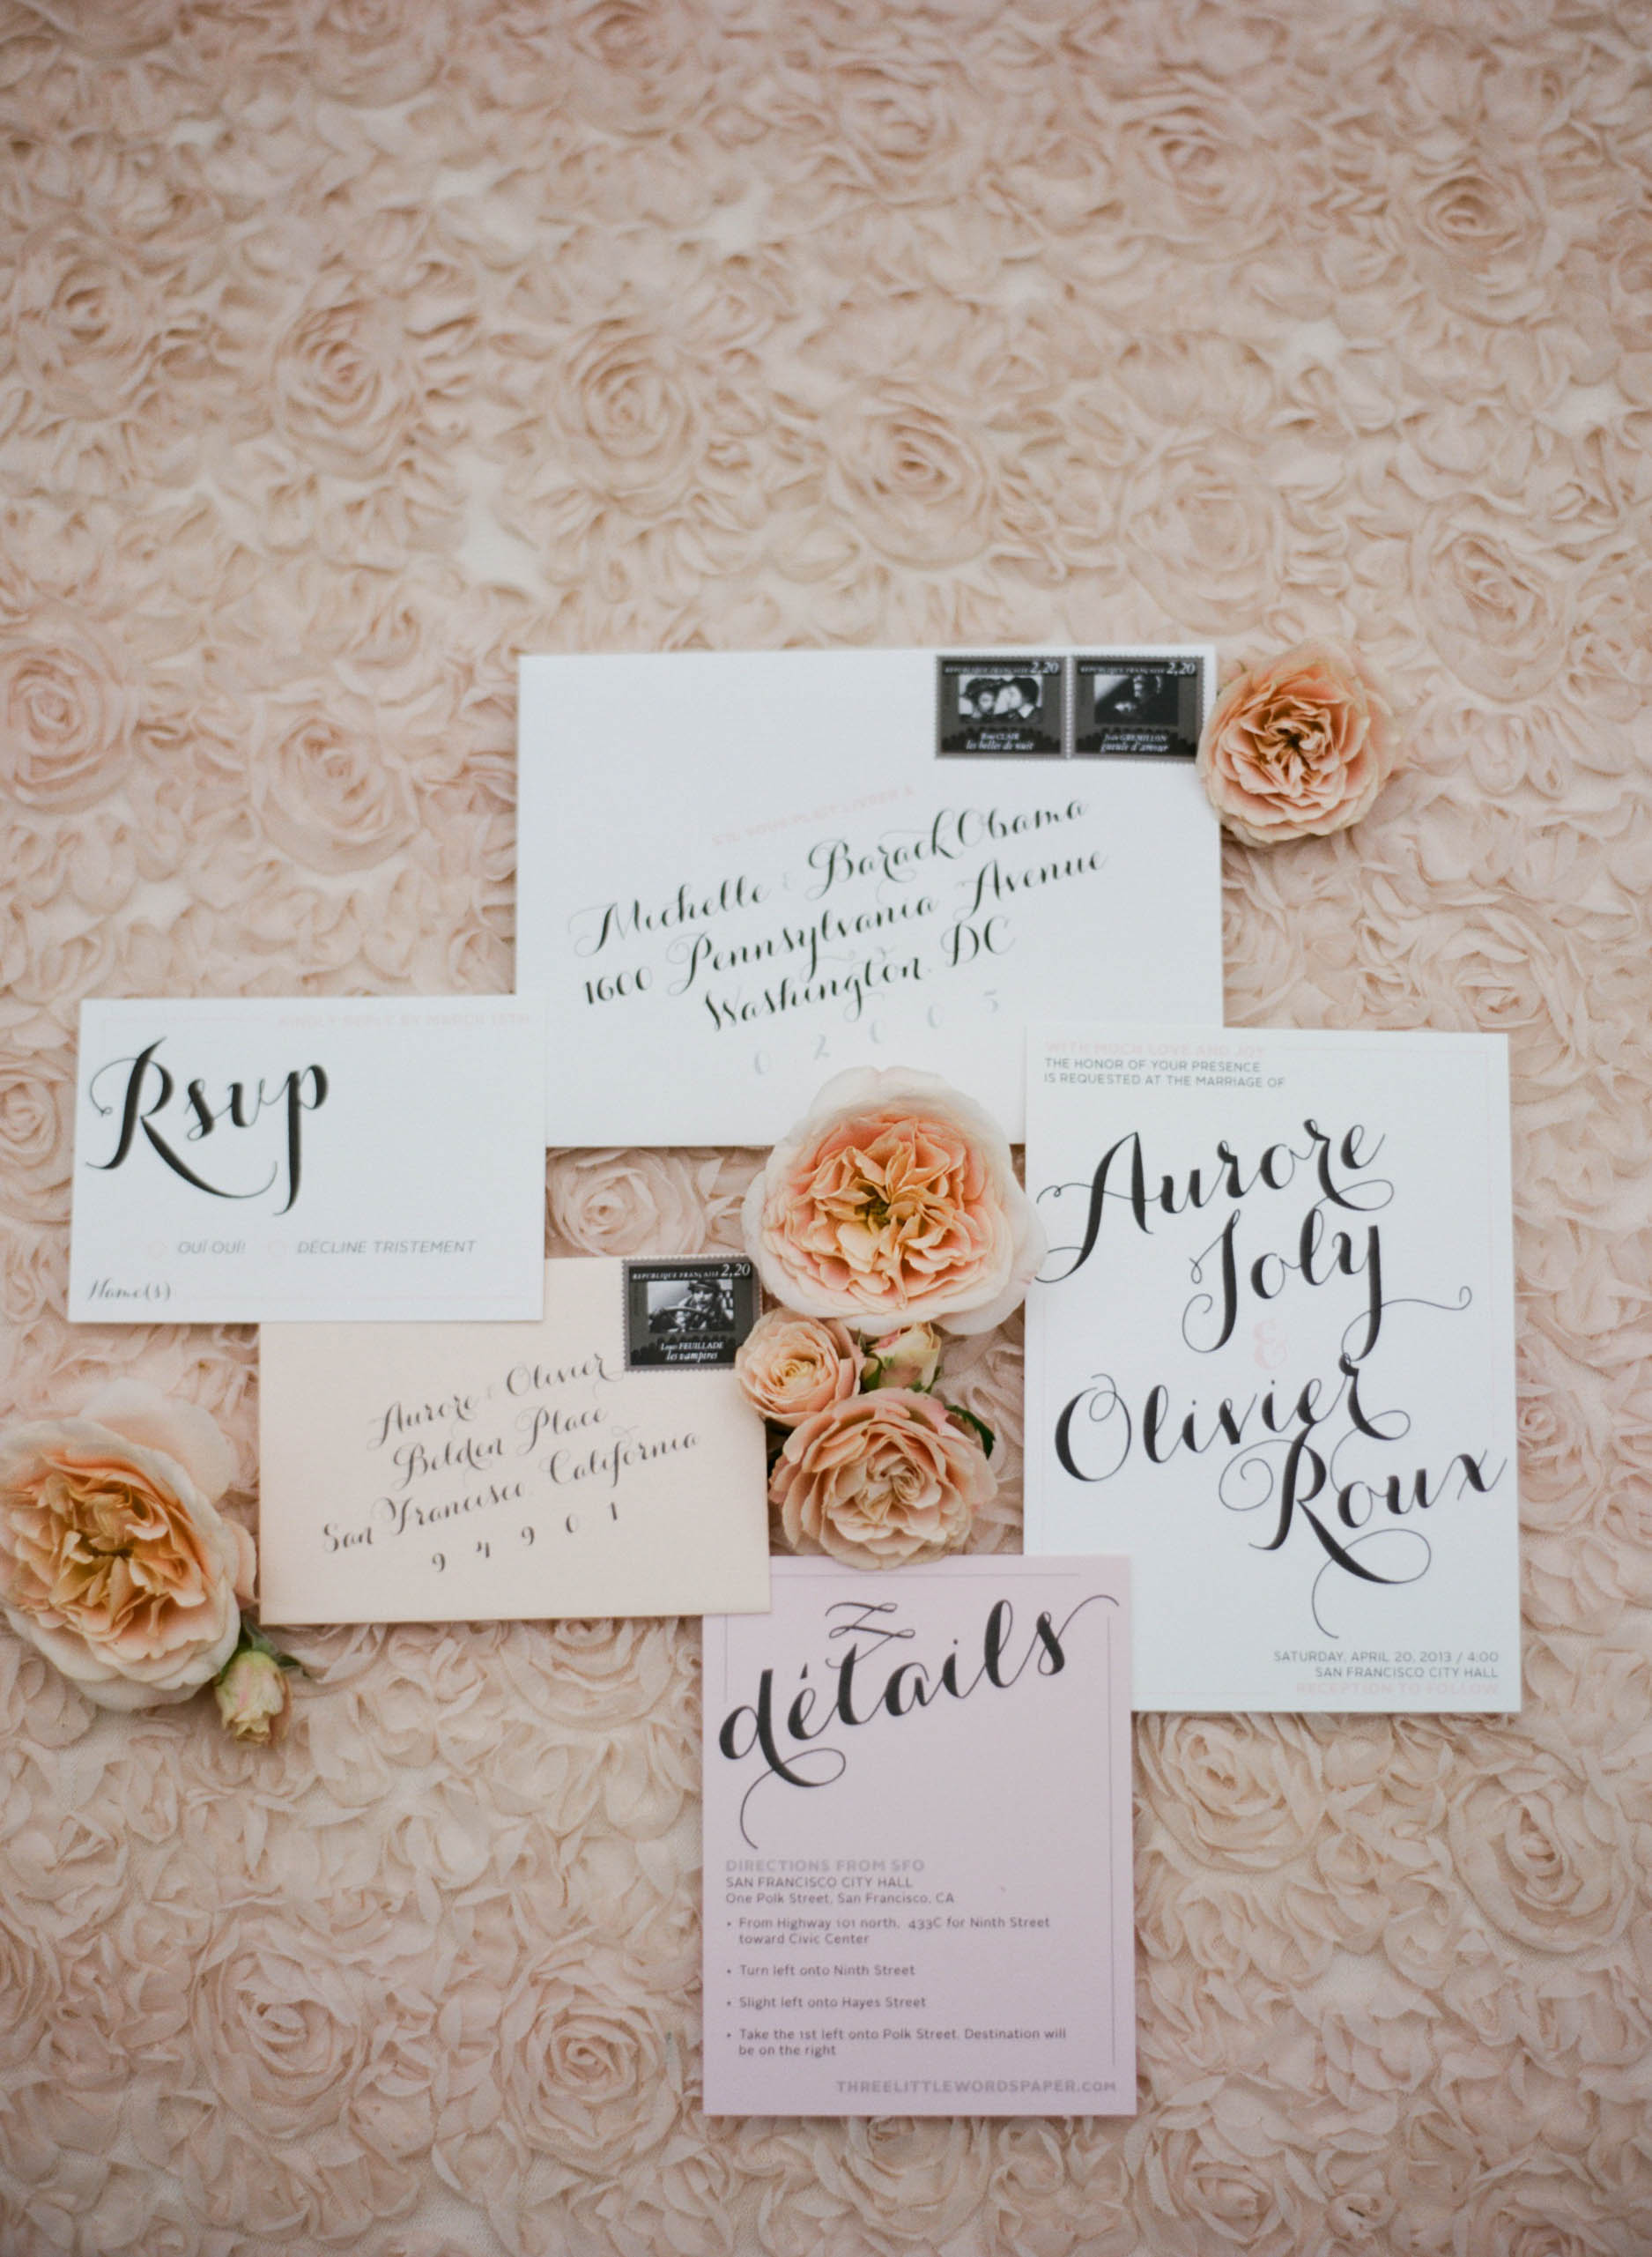 049-082-80920019SylvieGil-Paris-macaroons-red hair bride-romantic wedding-french weddingSylvieGil.jpg